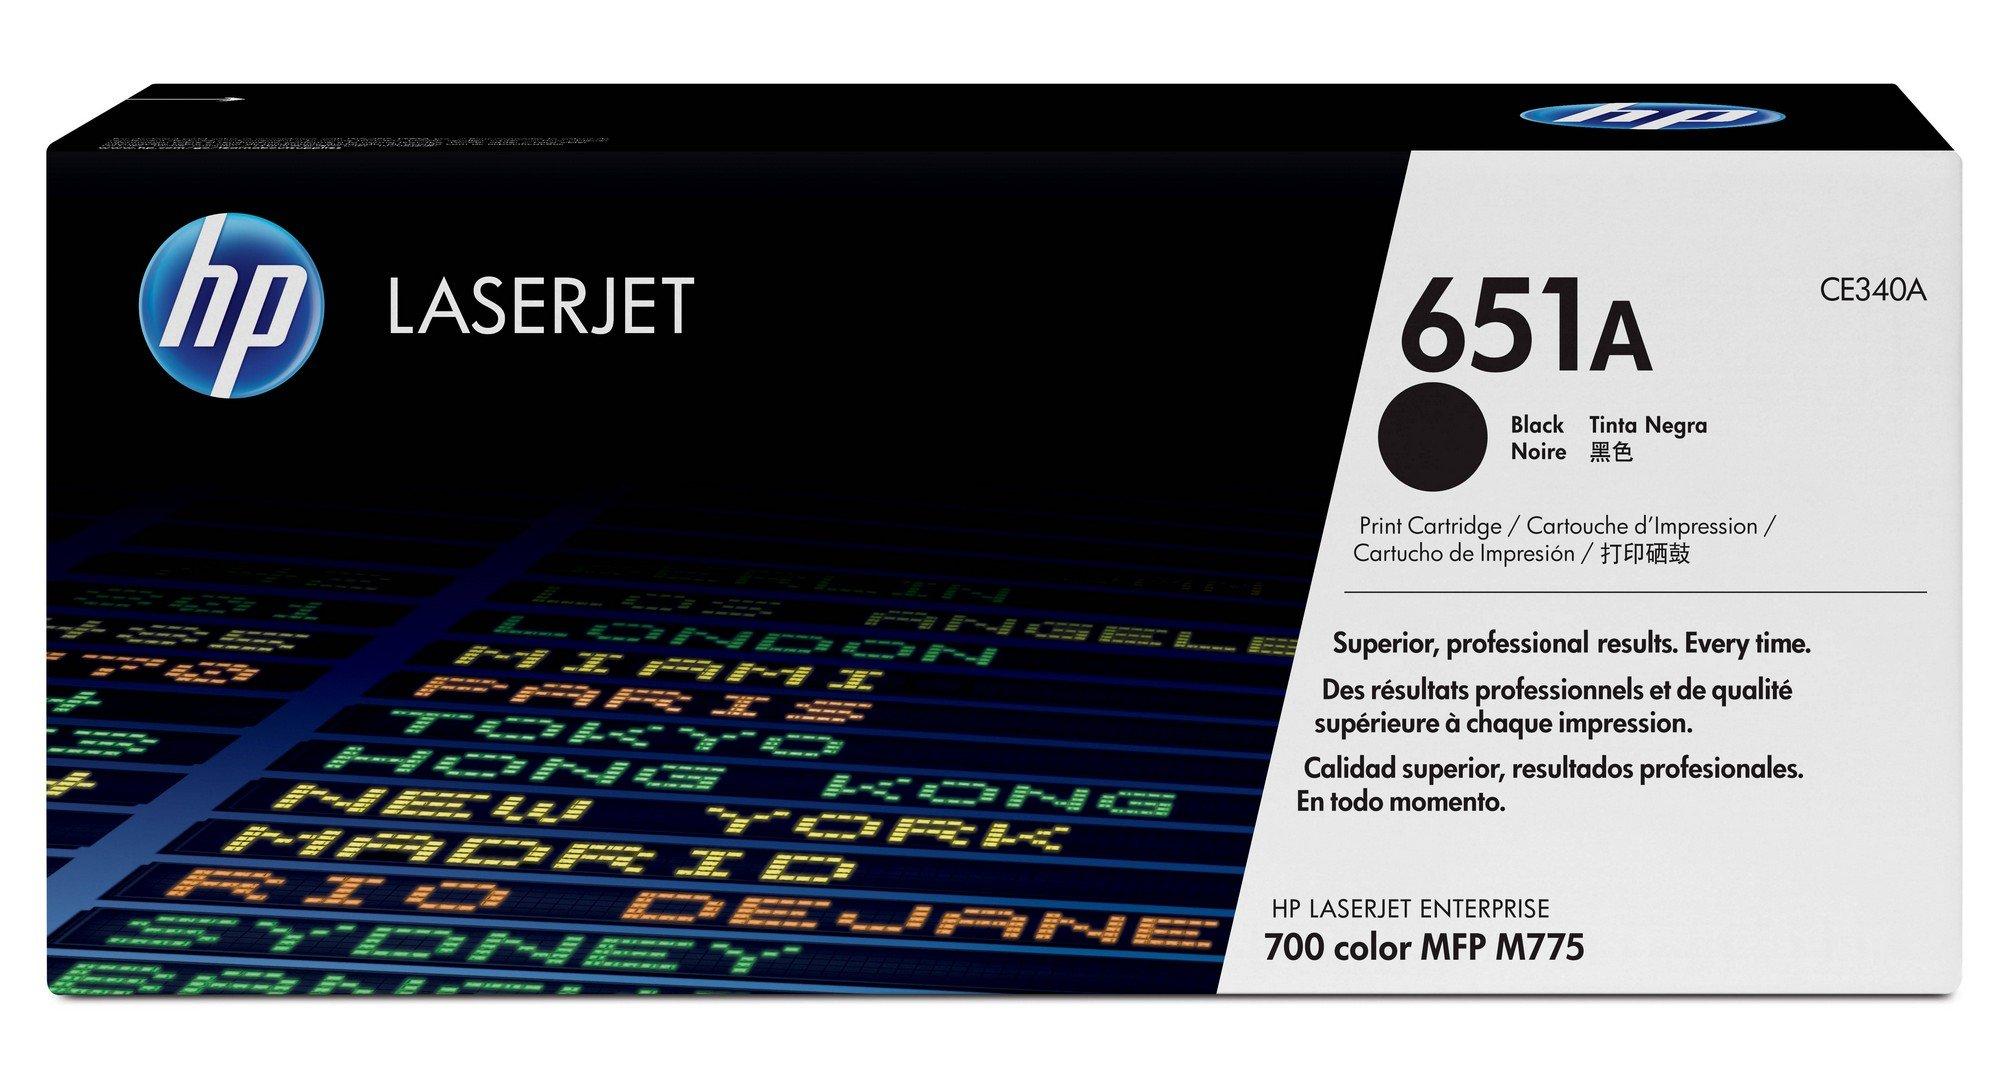 Toner Original HP 651A CE340A Black